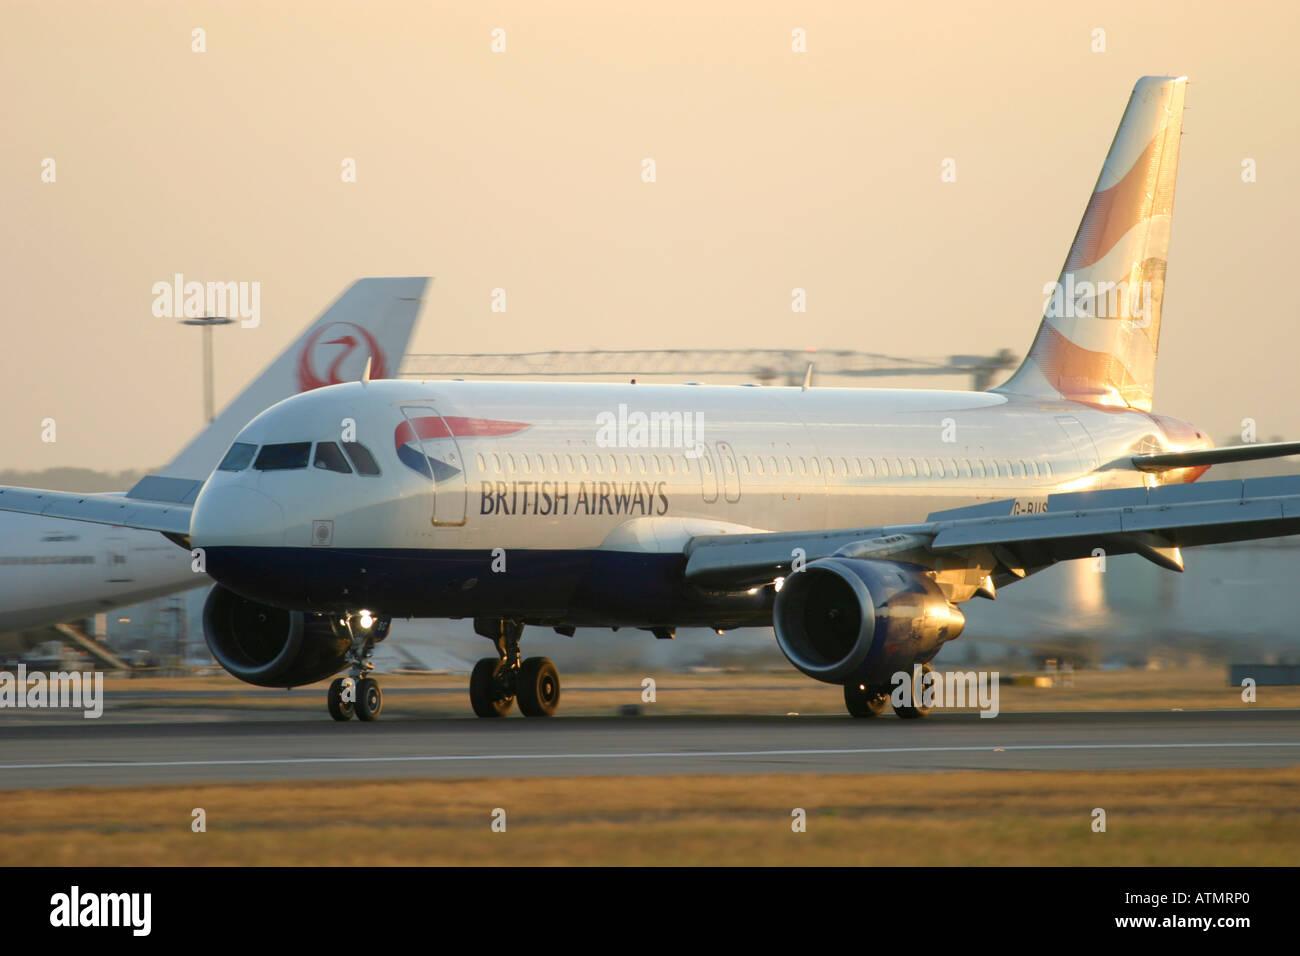 British Airways Airbus A320-111 at London Heathrow Airport - Stock Image